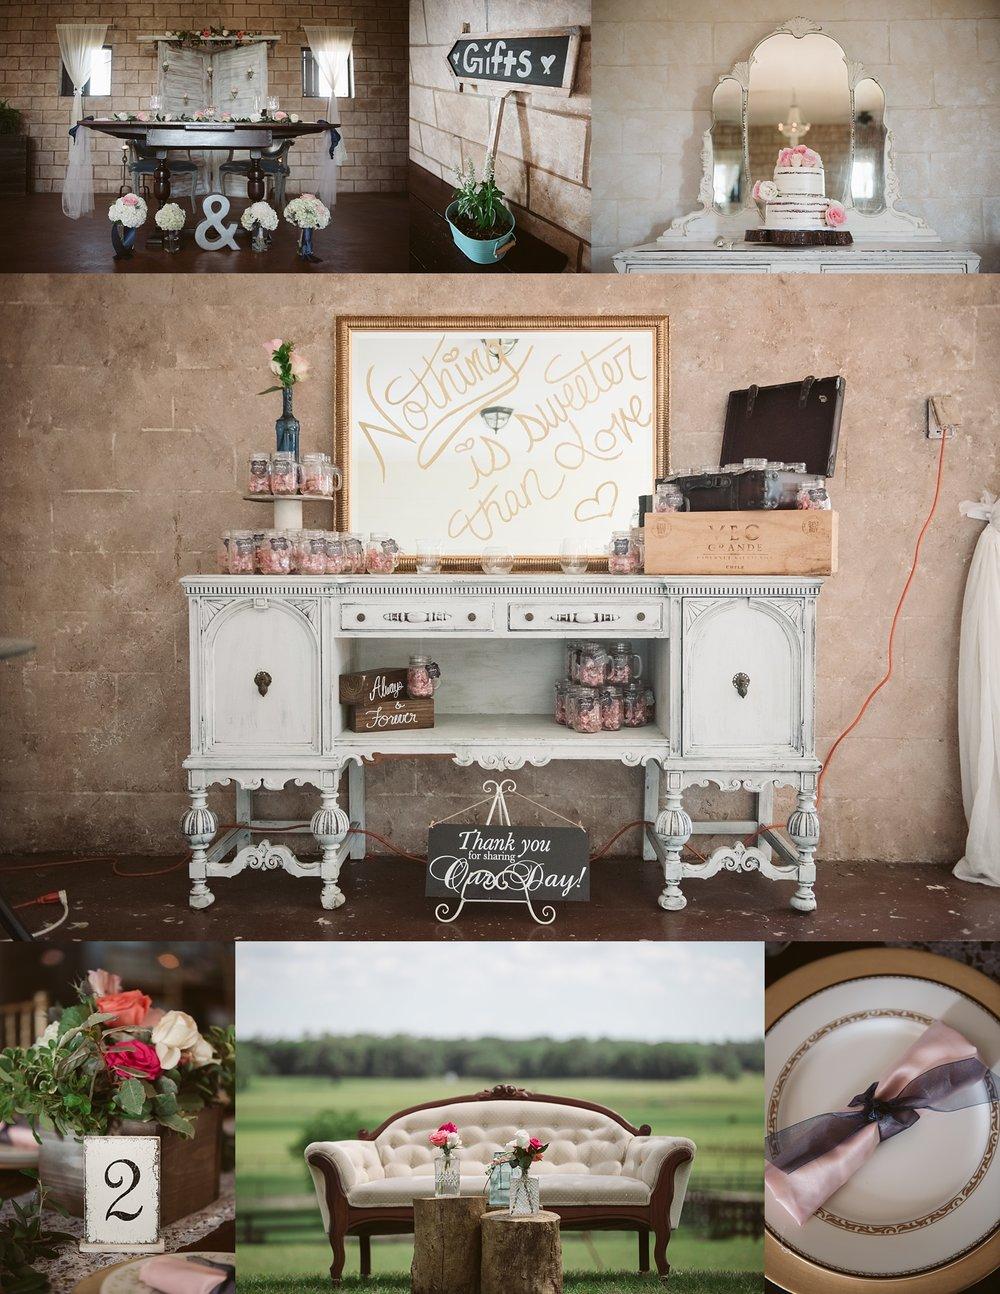 barrington_hill_farm_wedding_0019.jpg